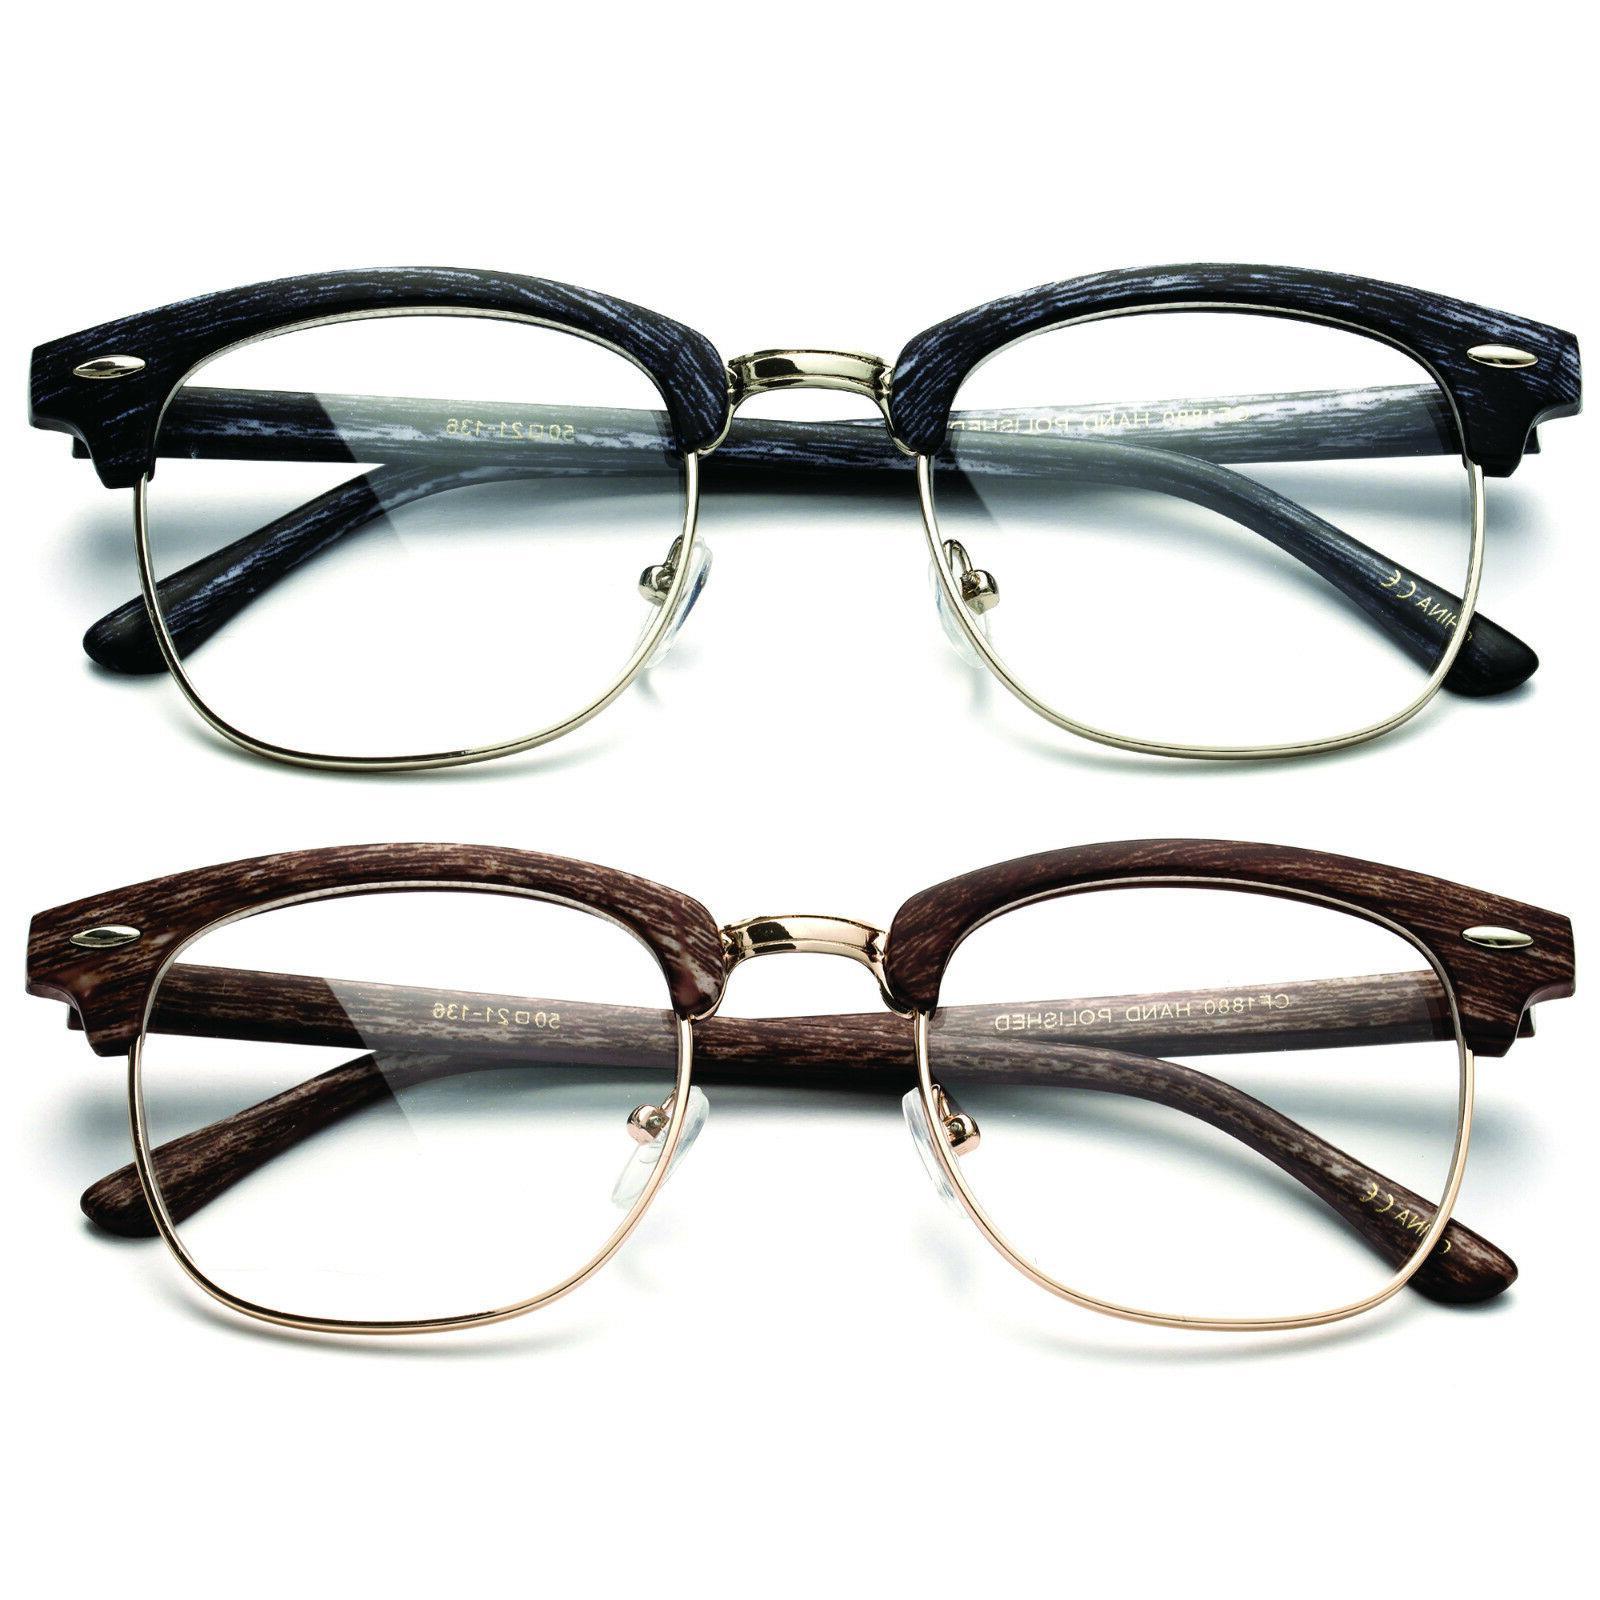 Interview Clear Glasses Vintage Nerd Geek Retro 100%